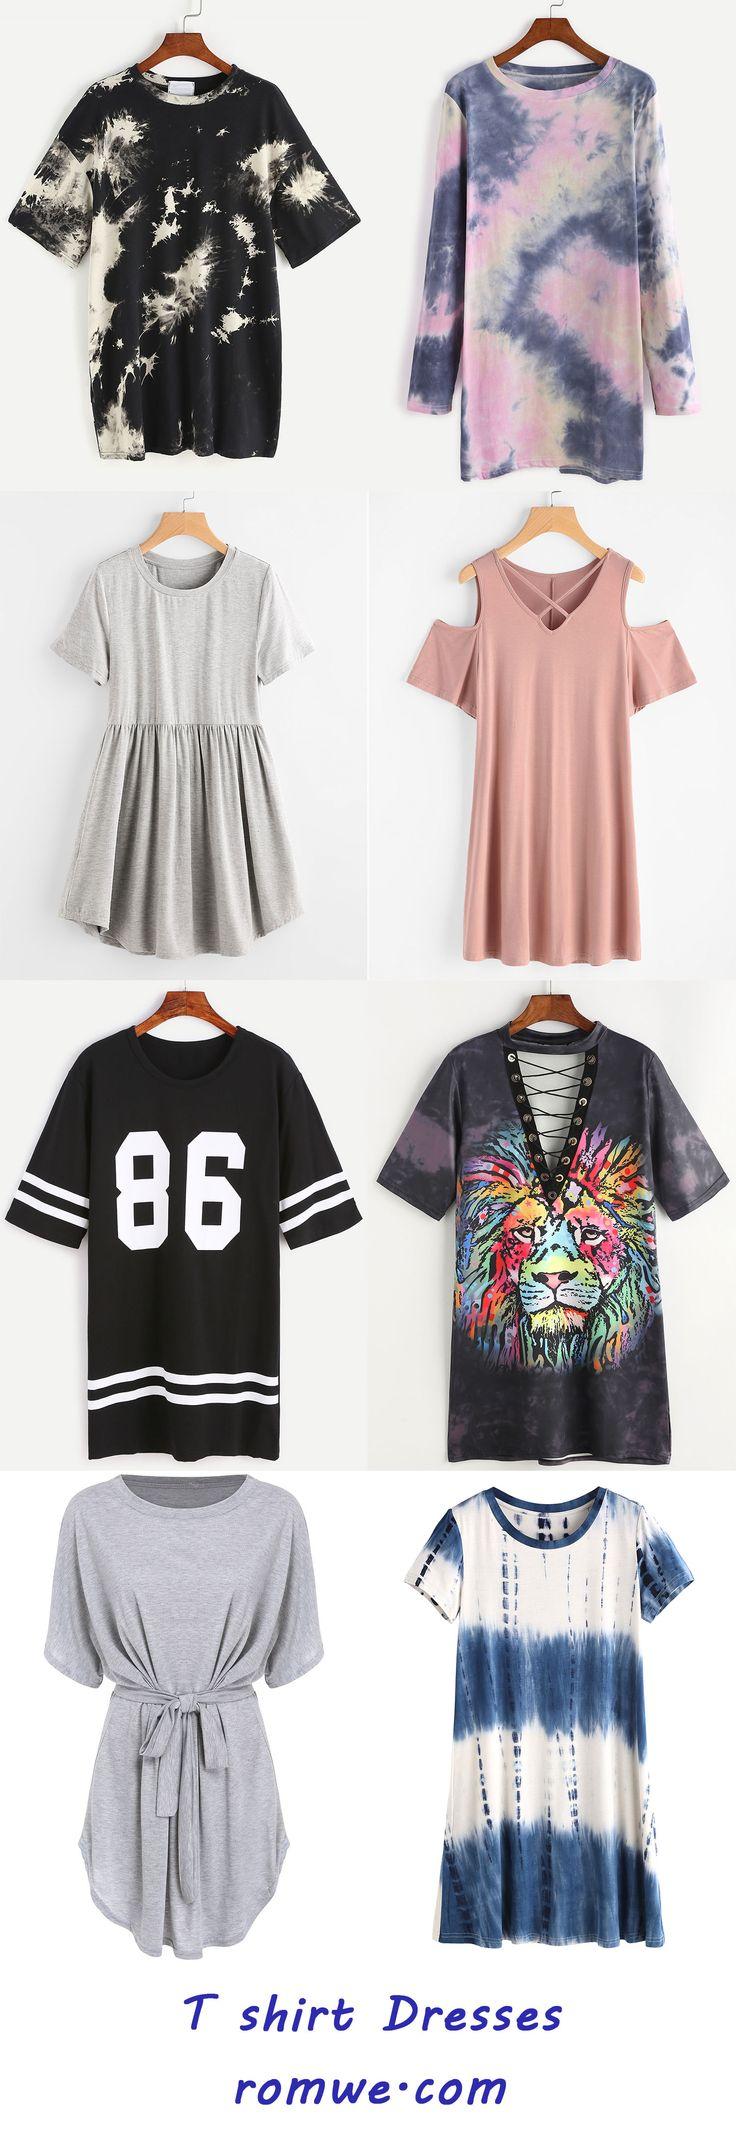 T shirt Dresses Collection 2017 - romwe.com